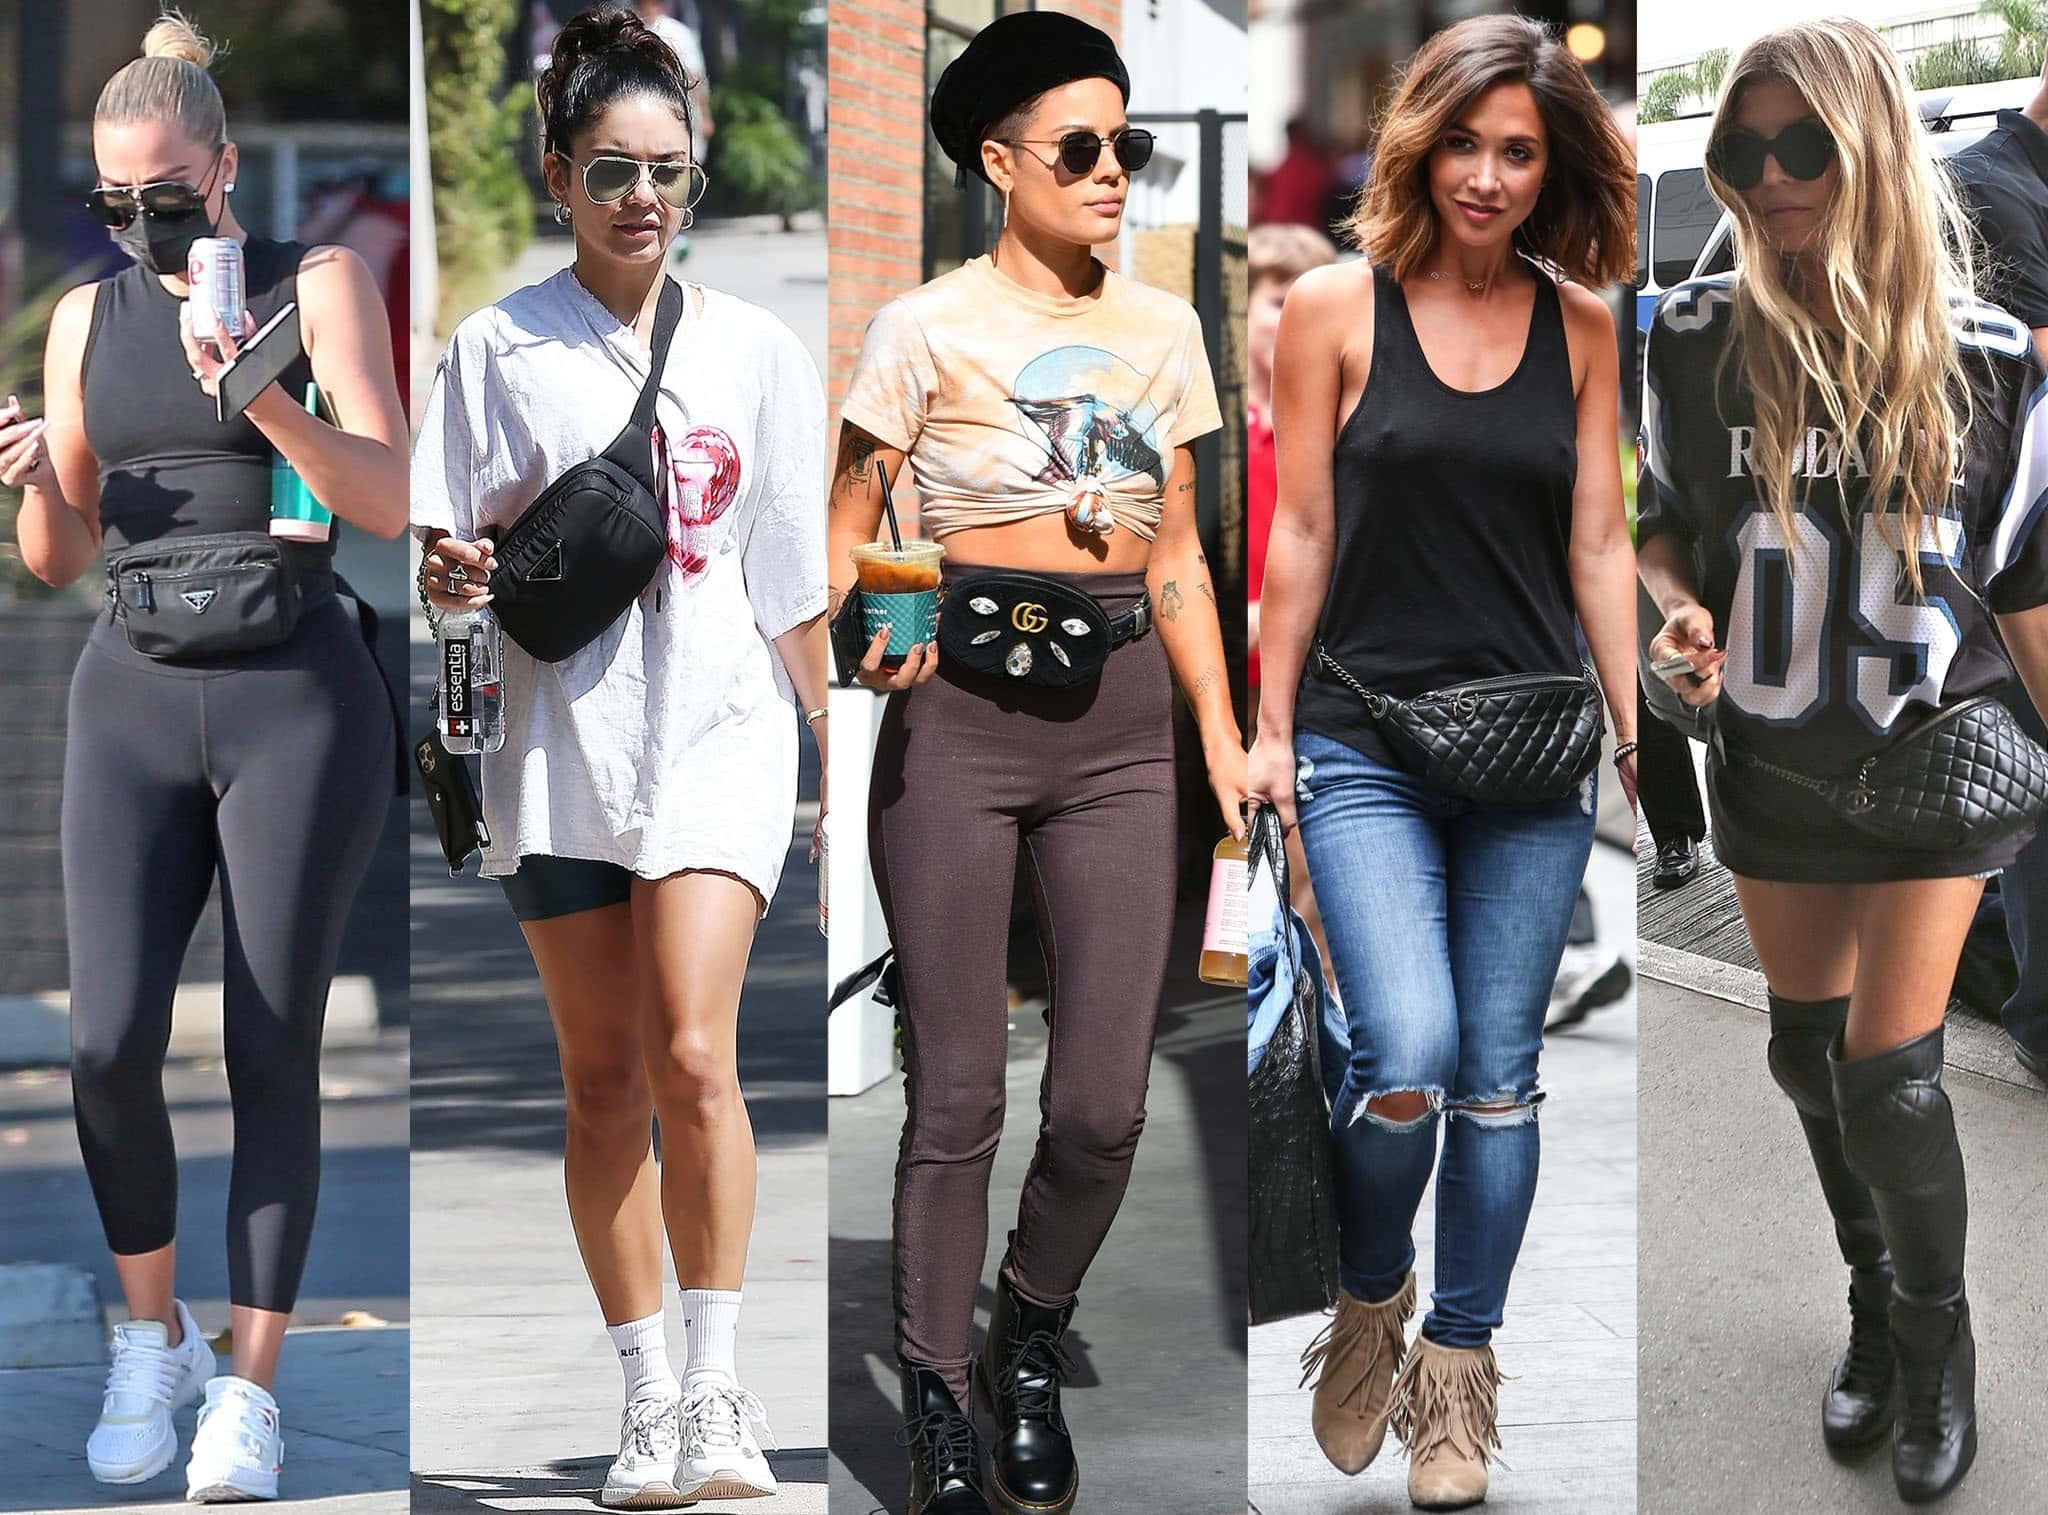 Khloe Kardashian, Vanessa Hudgens, Halsey, Myleene Klass, and Fergie show how to carry a belt bag or a fanny pack